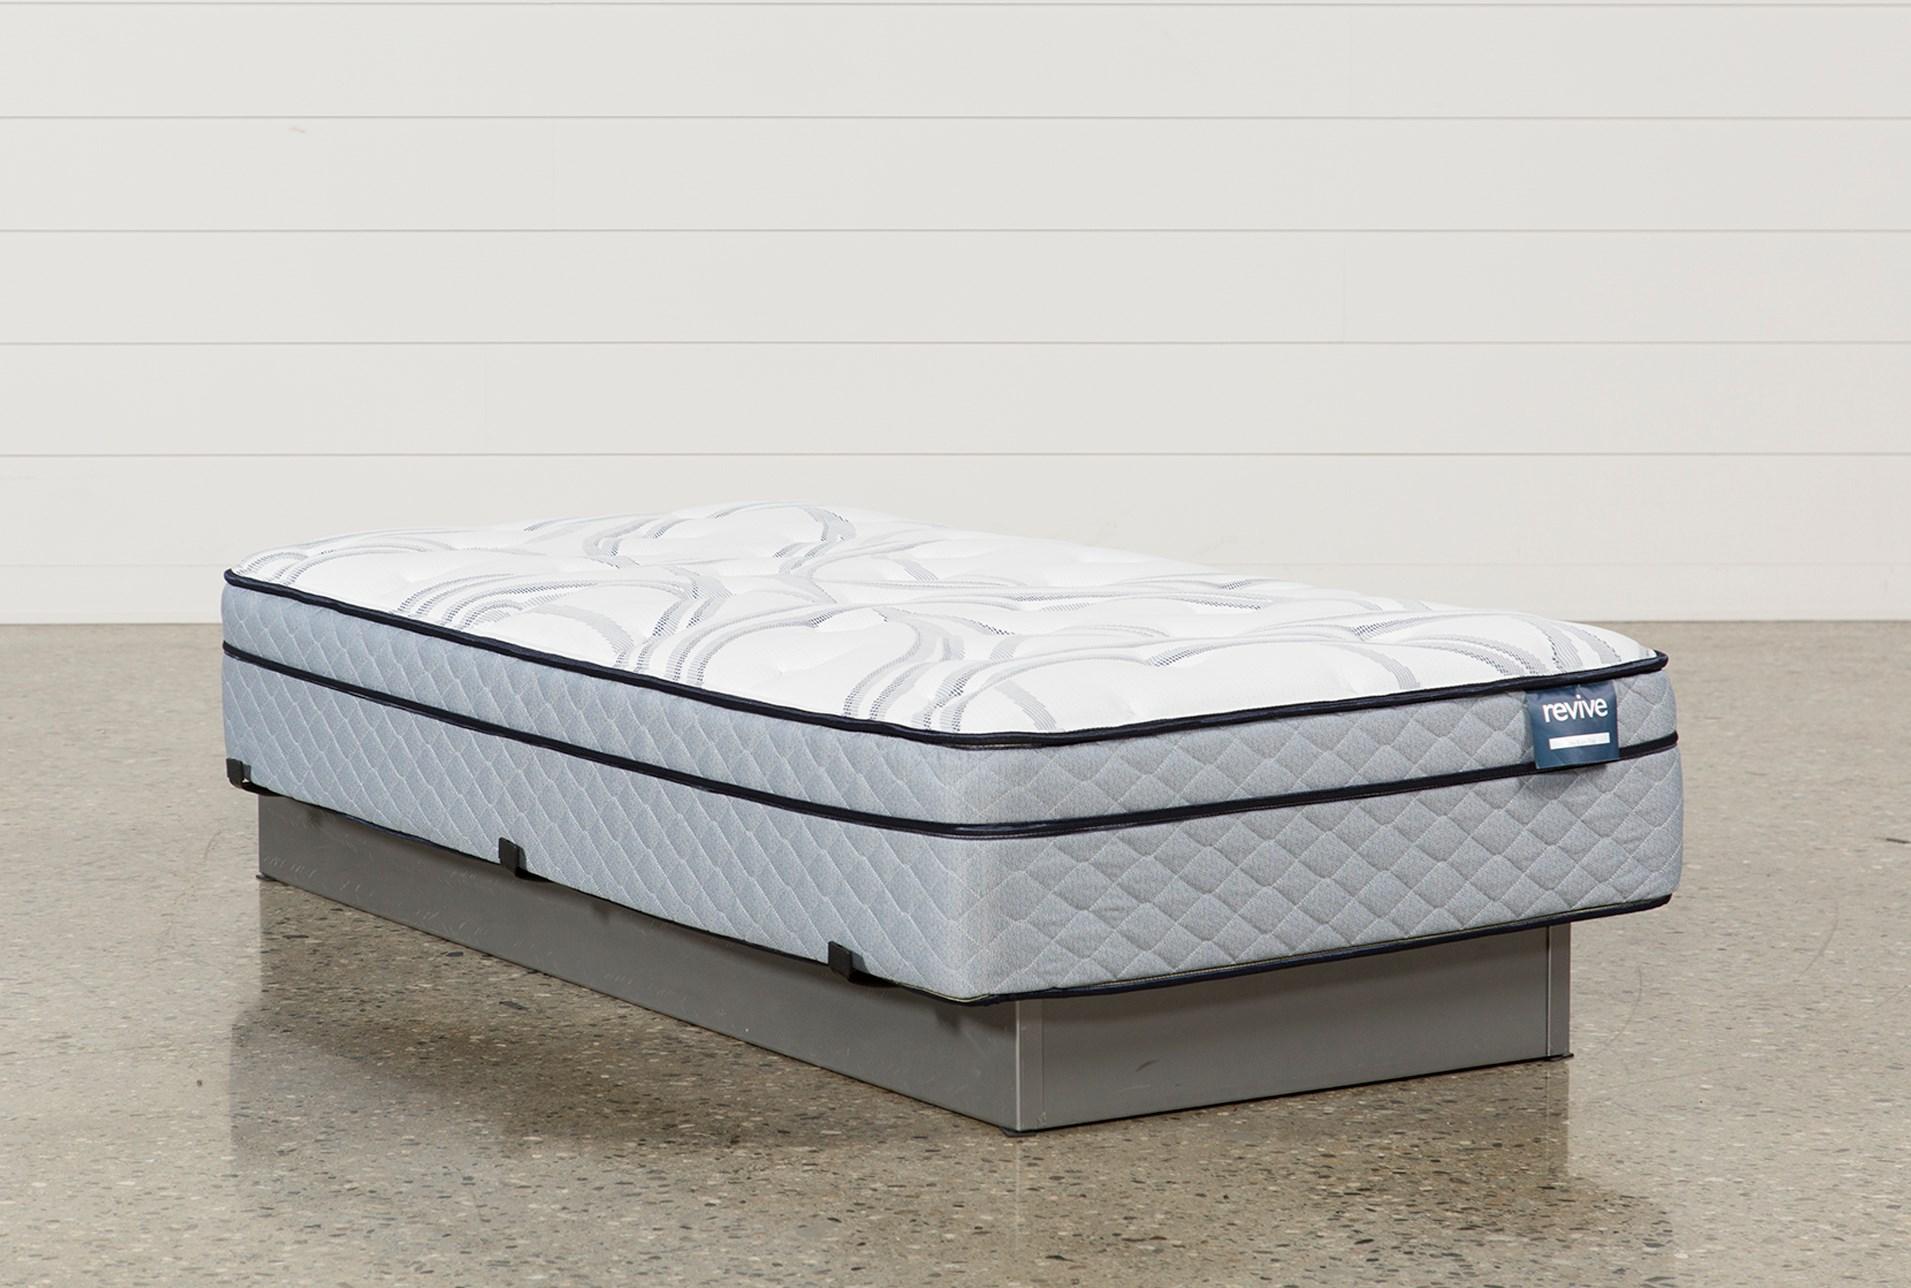 twin mattress pillow top. Large View Twin Mattress Pillow Top Living Spaces